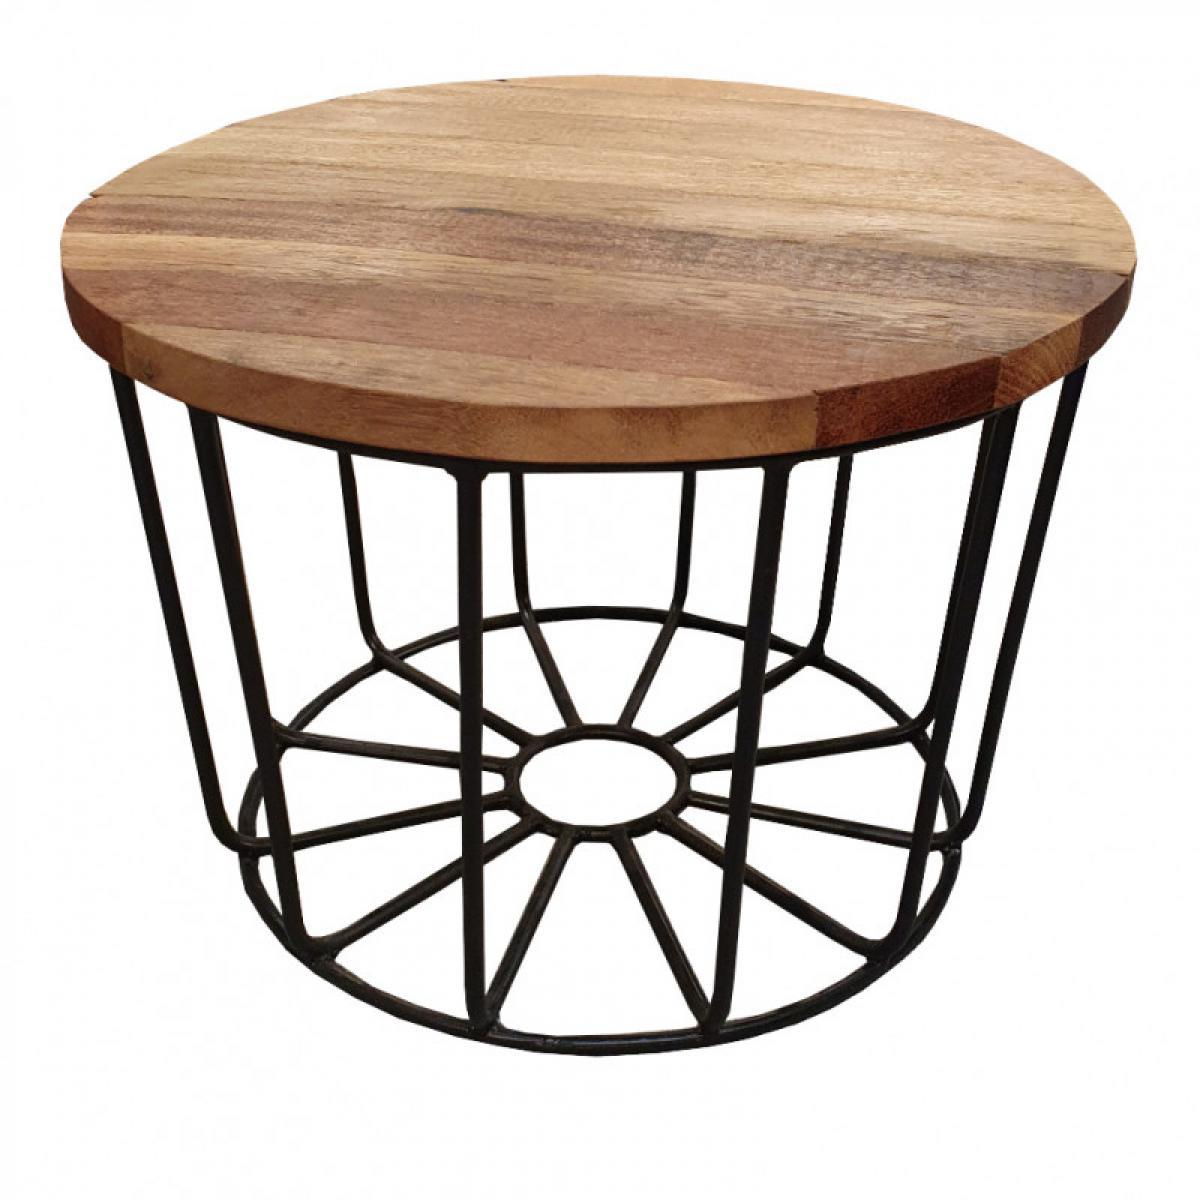 Meubletmoi Table basse ronde en métal et plateau amovible en teck D.50 cm - TEKO